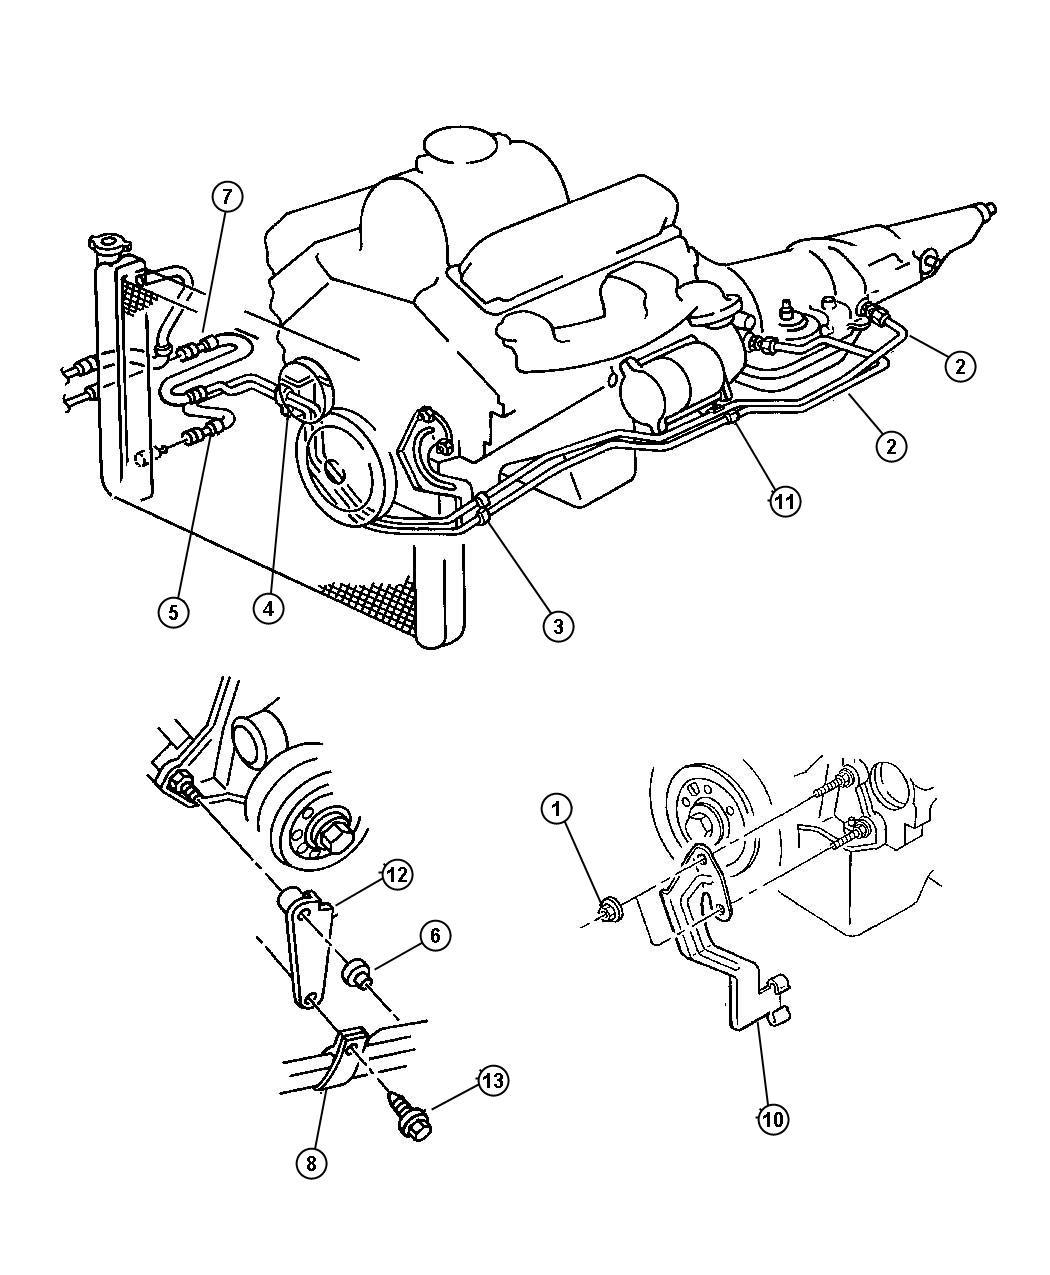 2000 Dodge Dakota CLUB CAB 6.5 FT BOX 4.7L V8 A/T